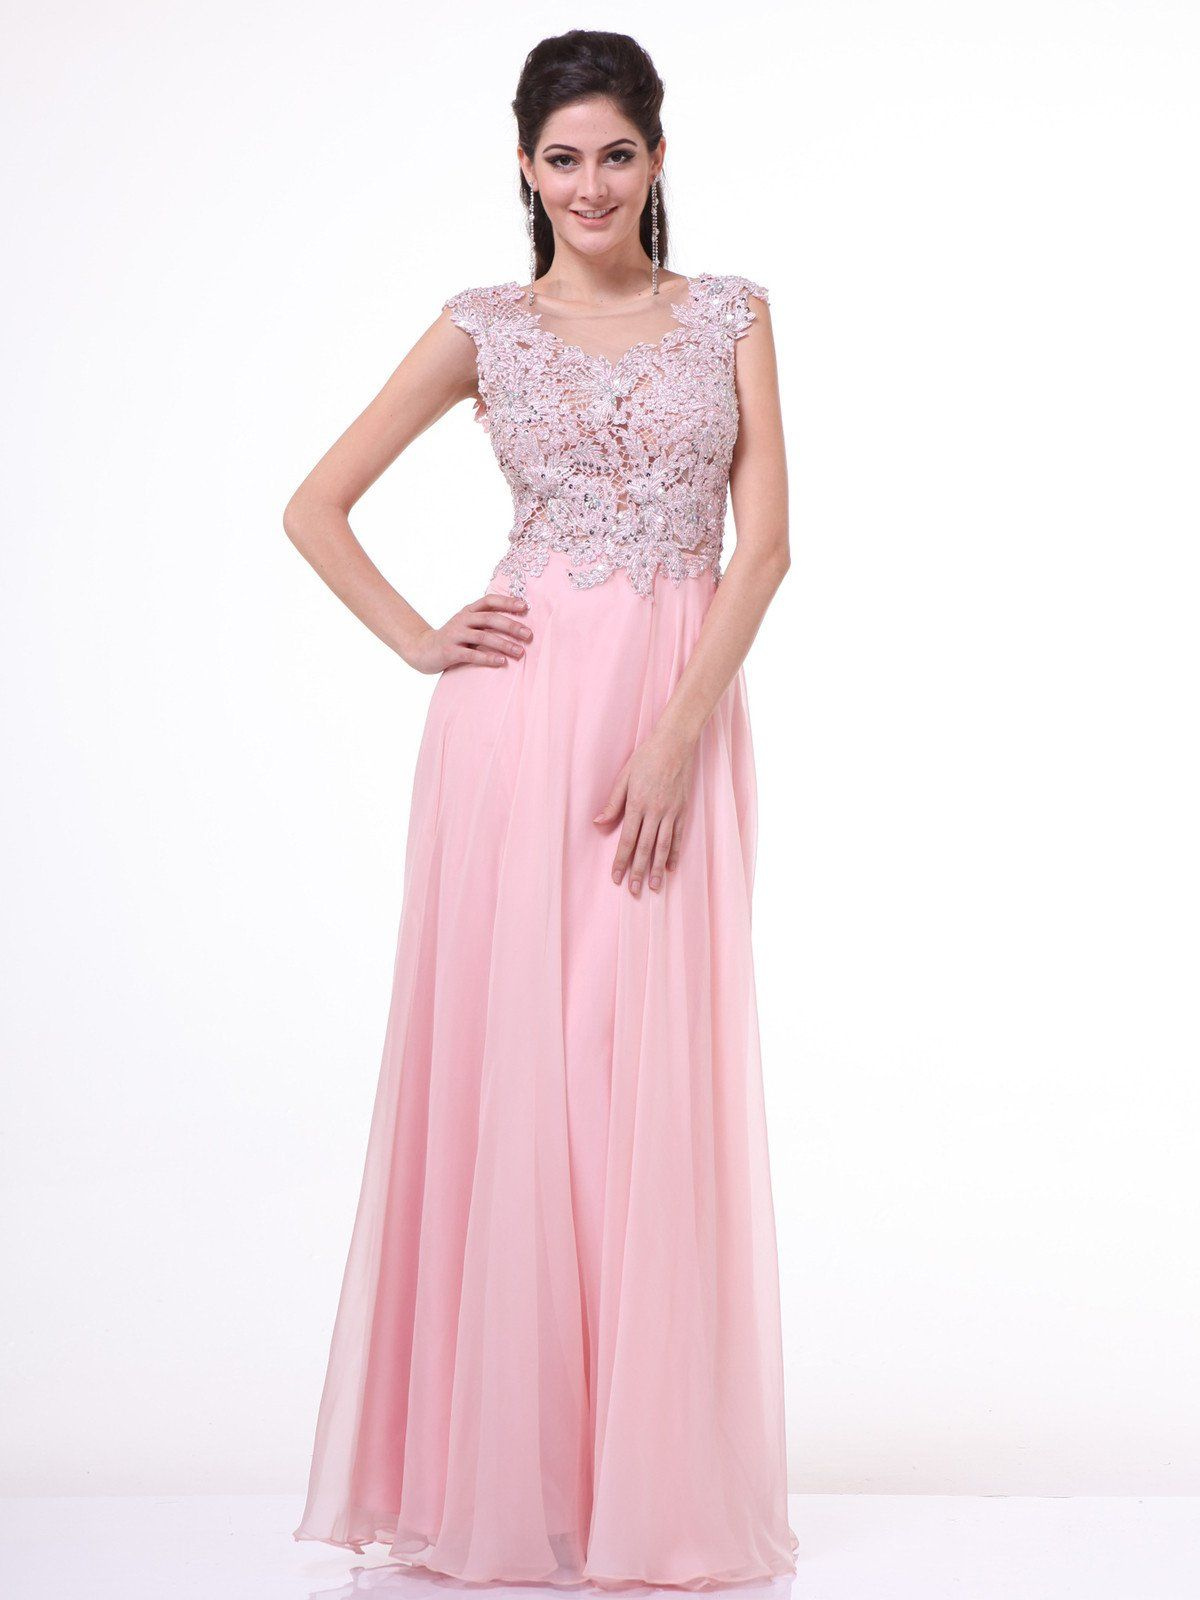 Embellished Illusion Evening Dress by Cinderella Divine CJ1022 ...